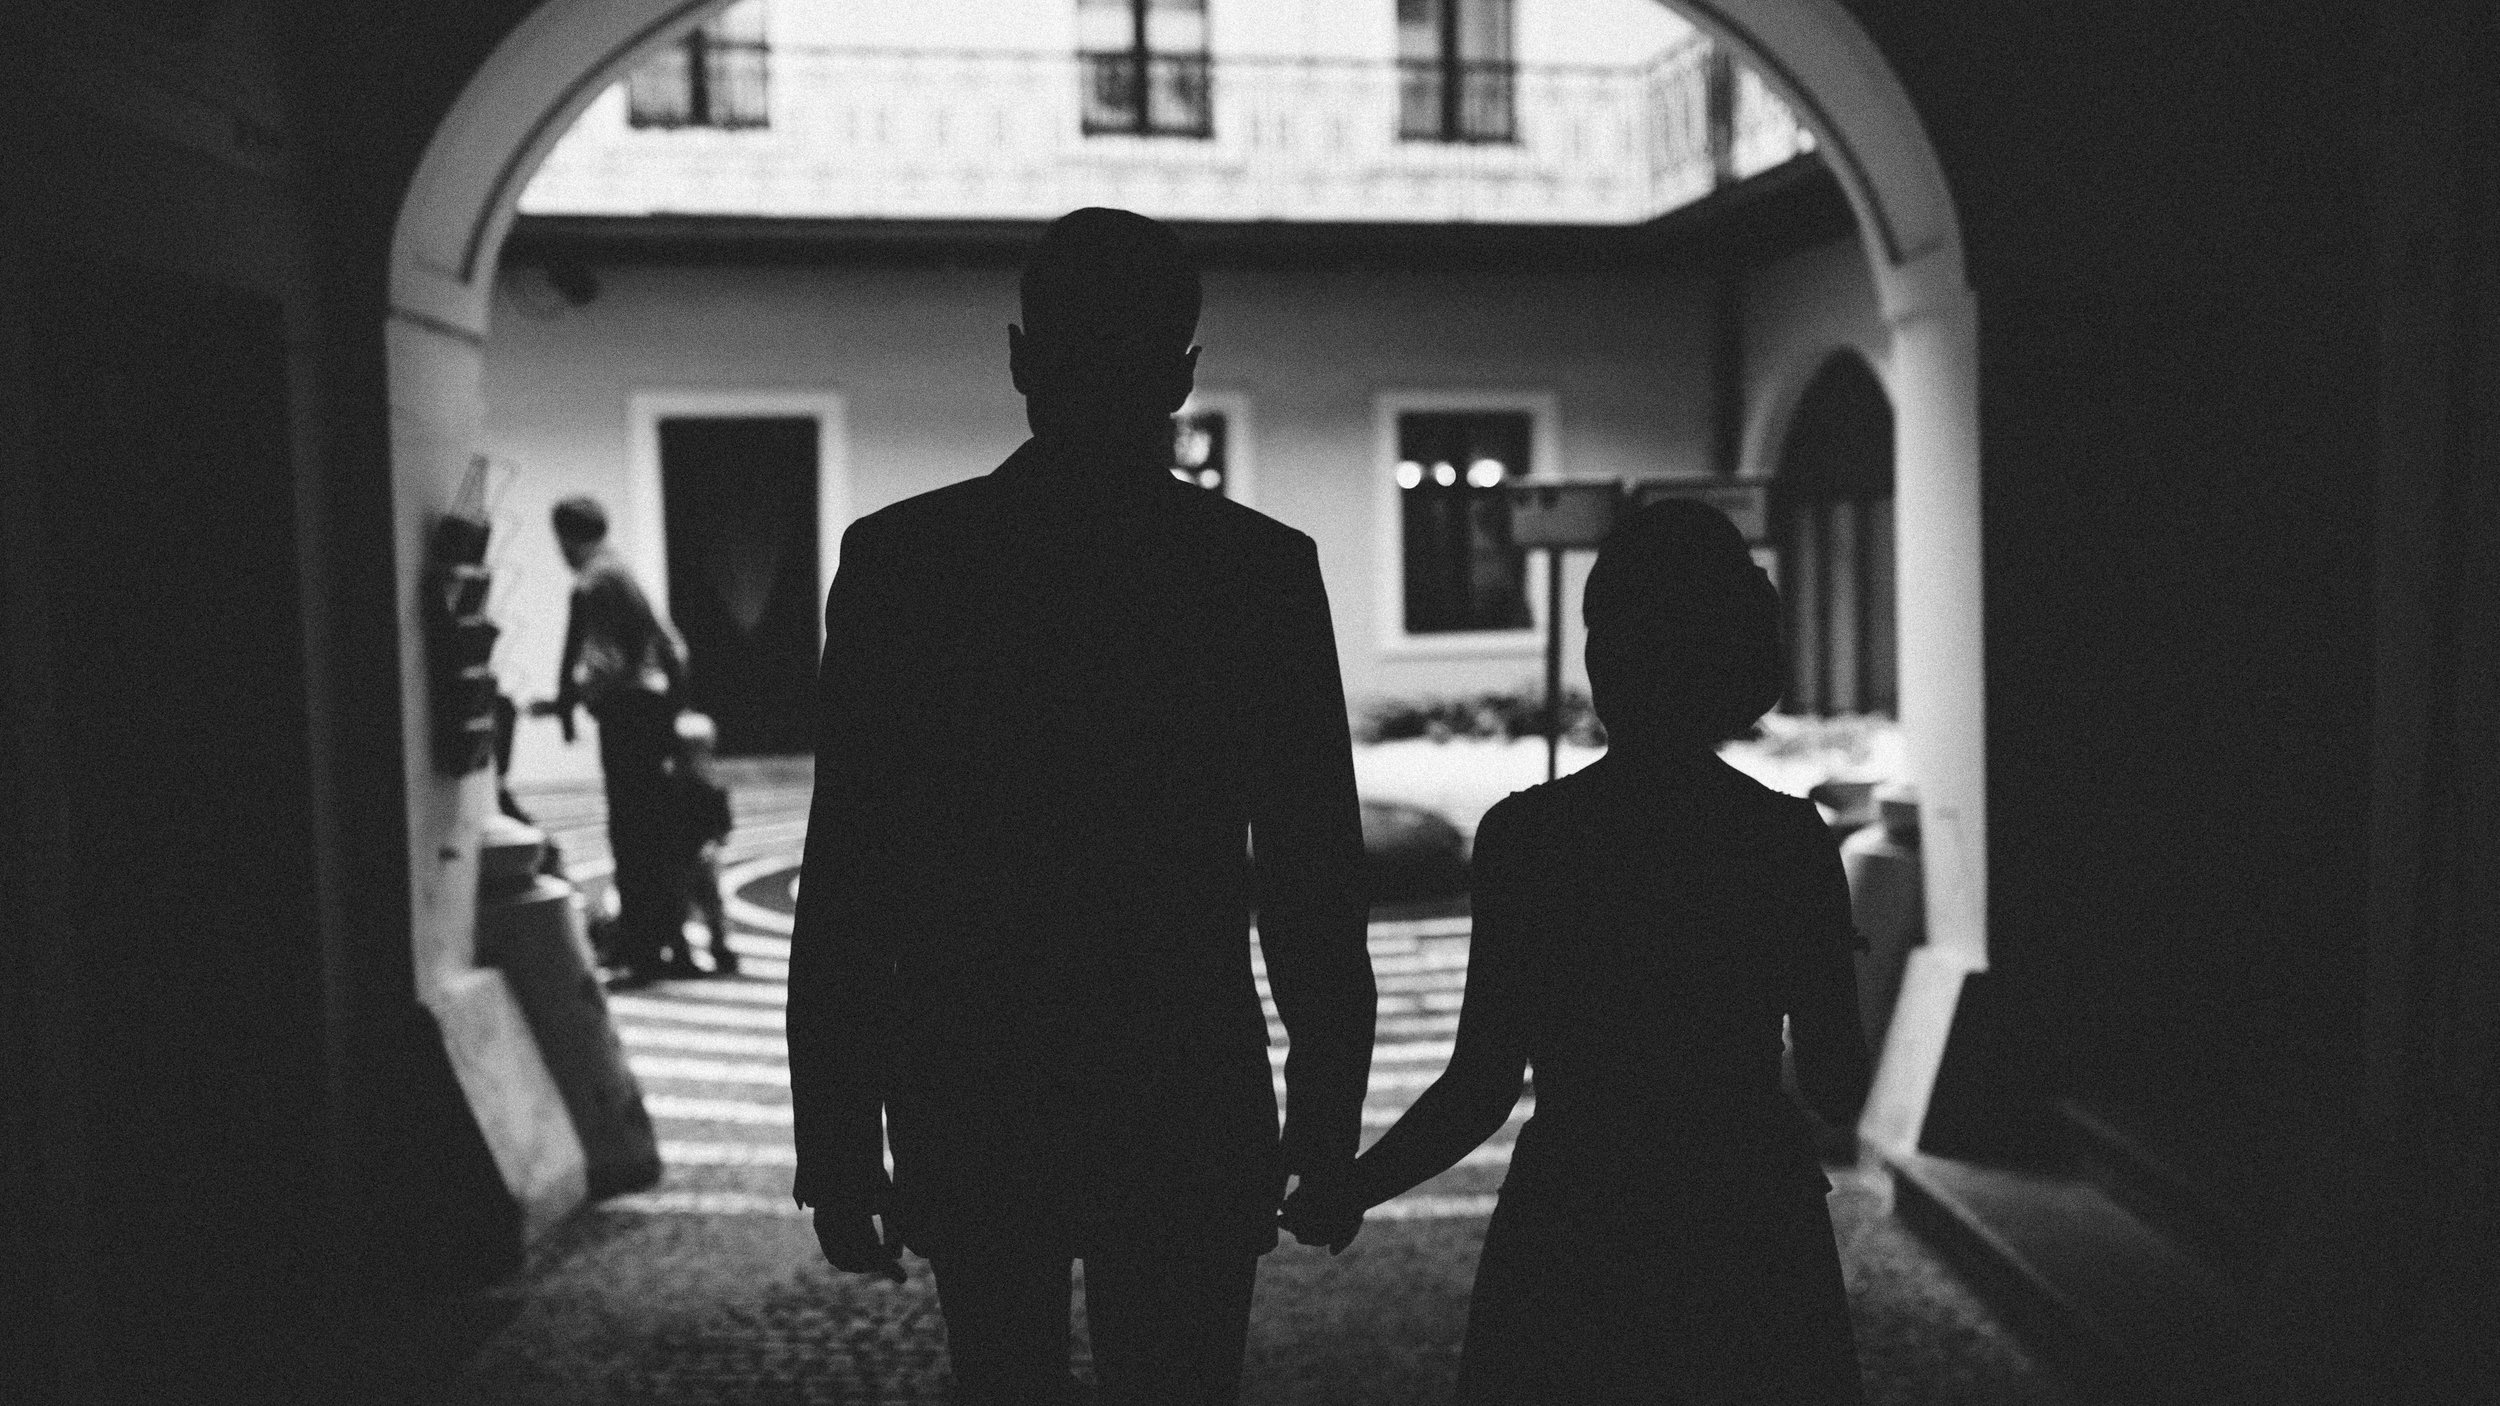 destination-wedding-photographer-bratislava-slovakia-europe-bw-documentary-dark-mystery-2.jpg